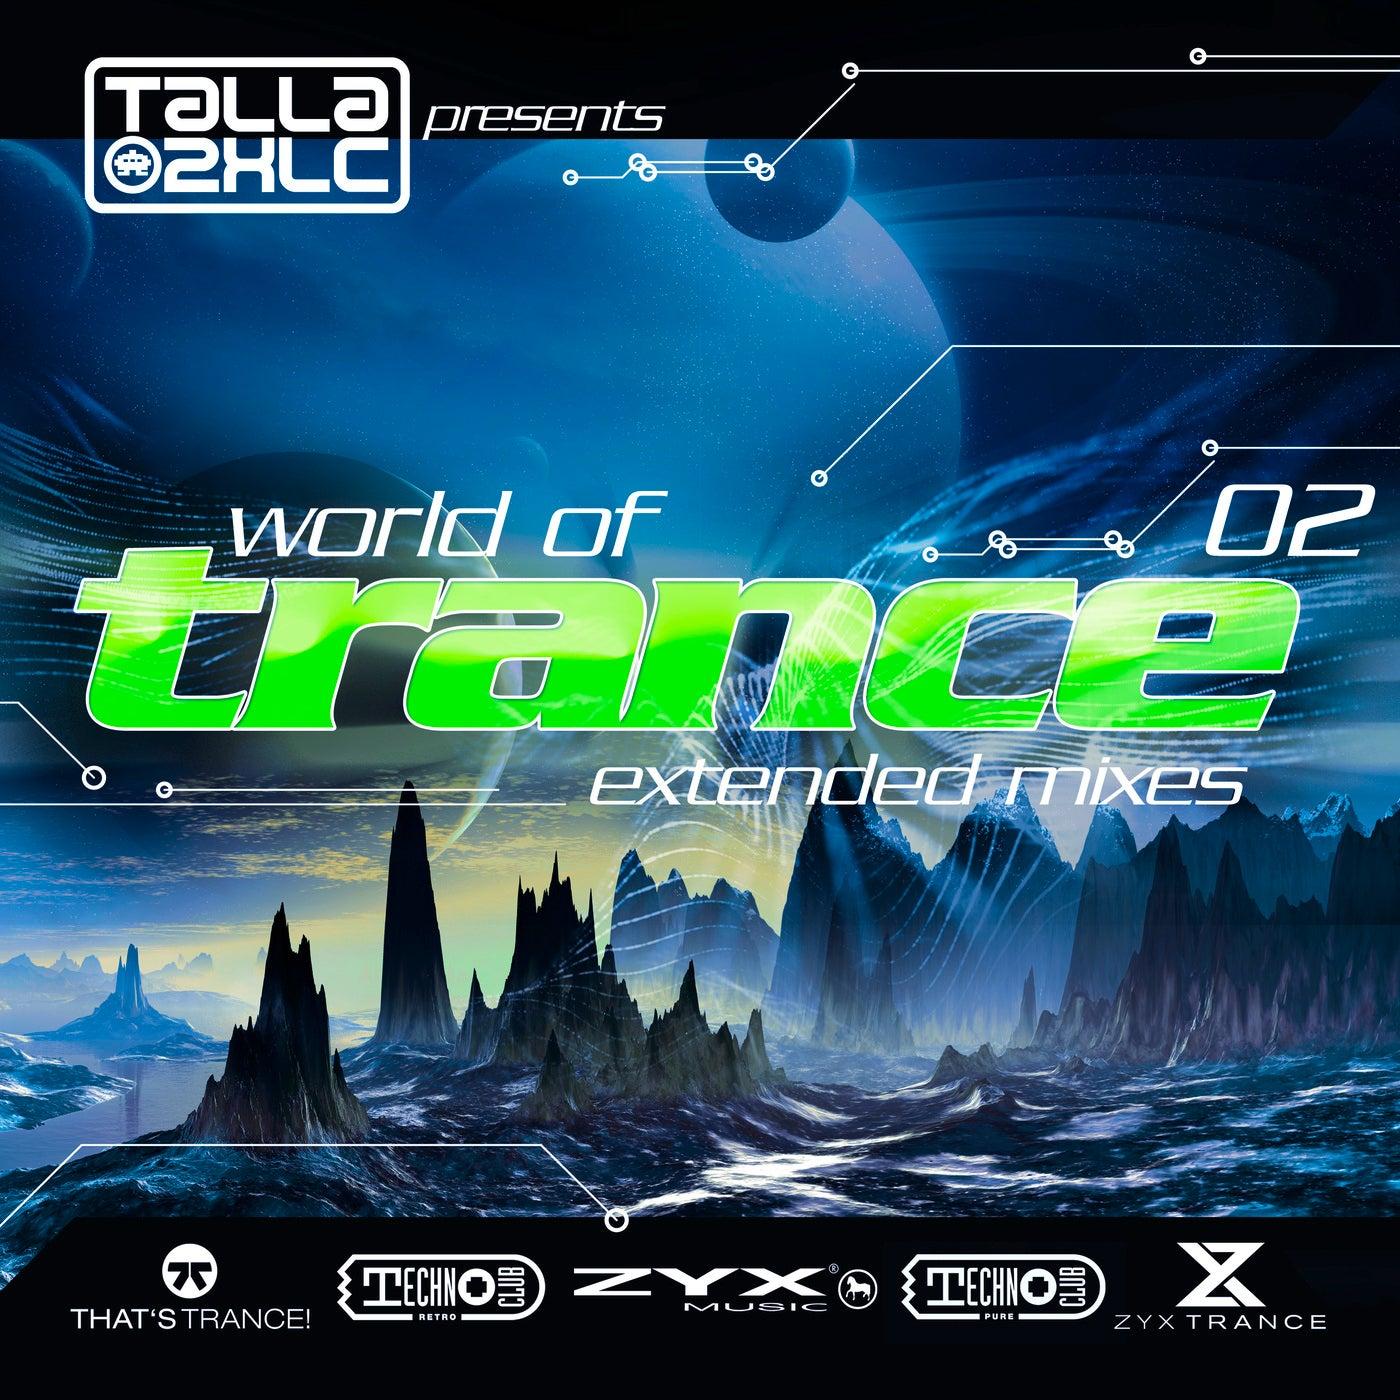 U Got 2 Let The Music 2k19 (Talla 2XLC vs.Junk Project Remix)